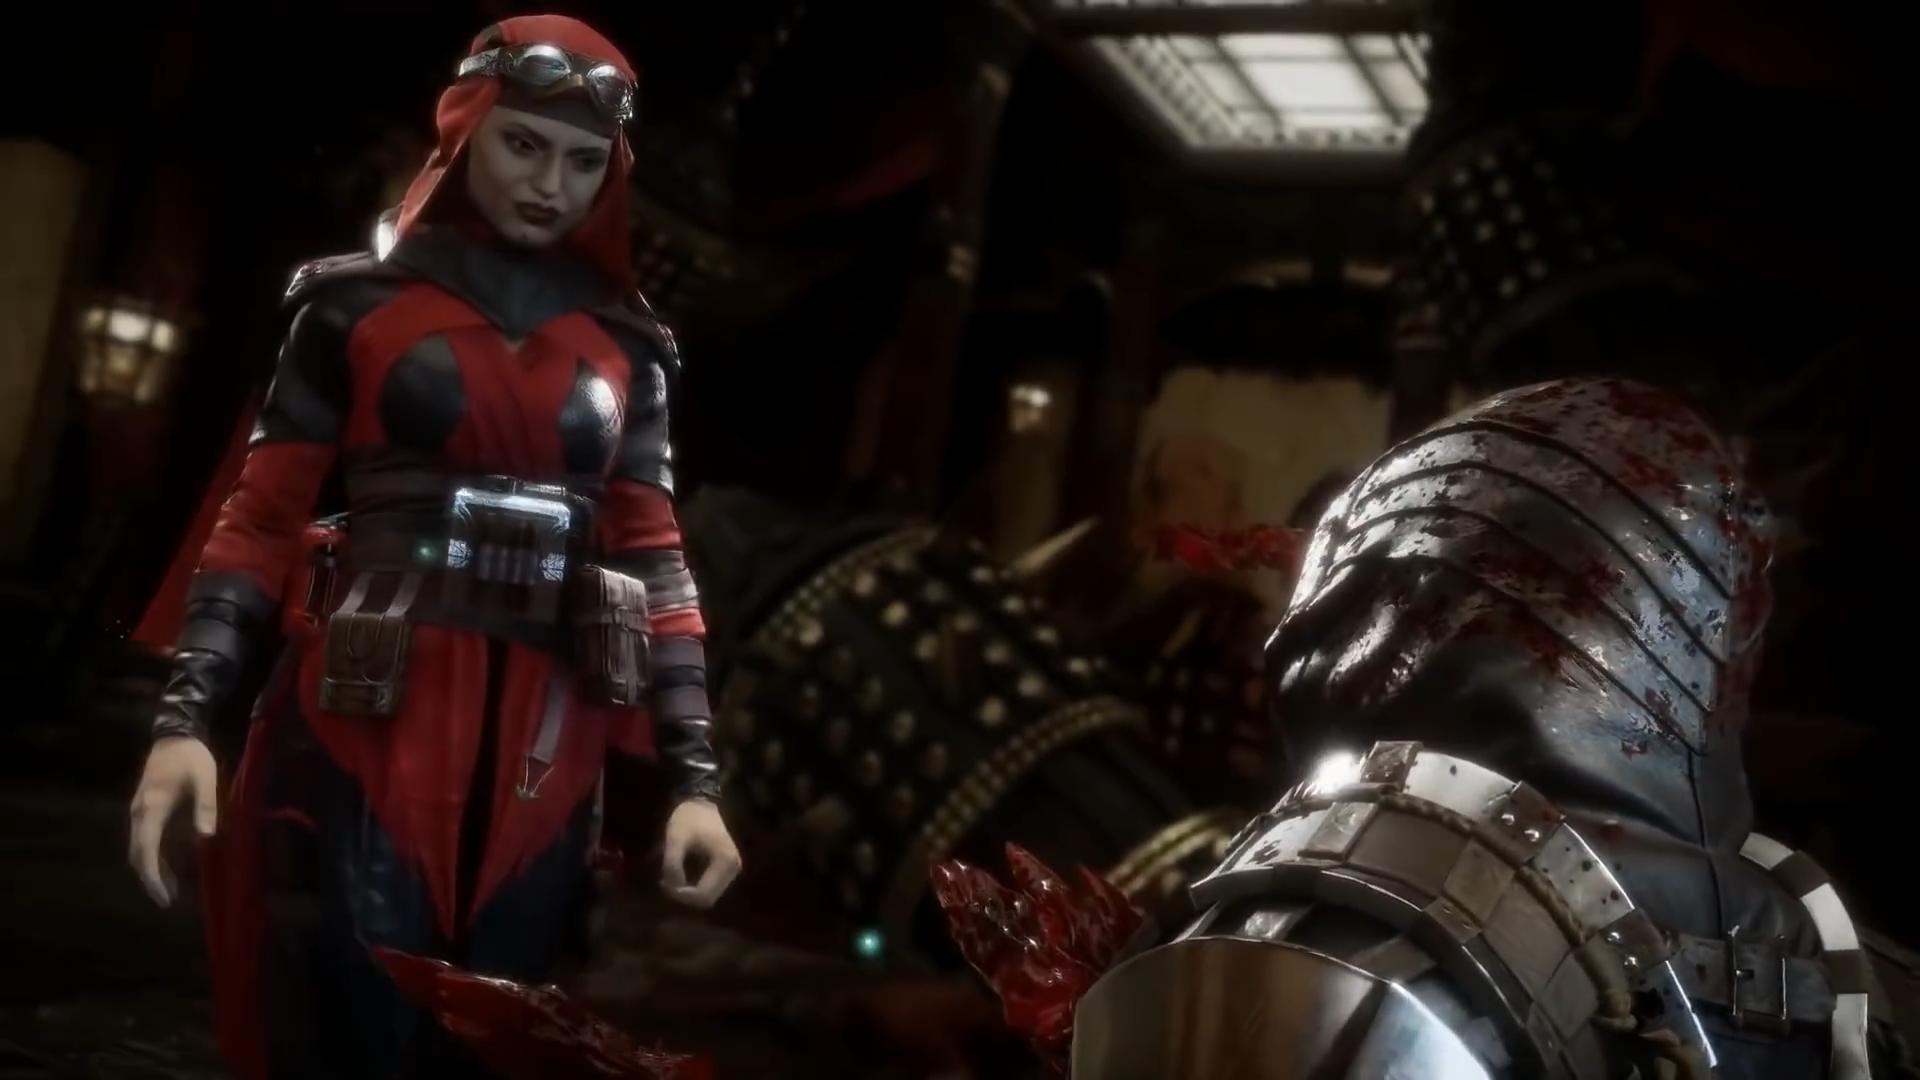 IMG_20190121_193712.983.jpg - Mortal Kombat 11